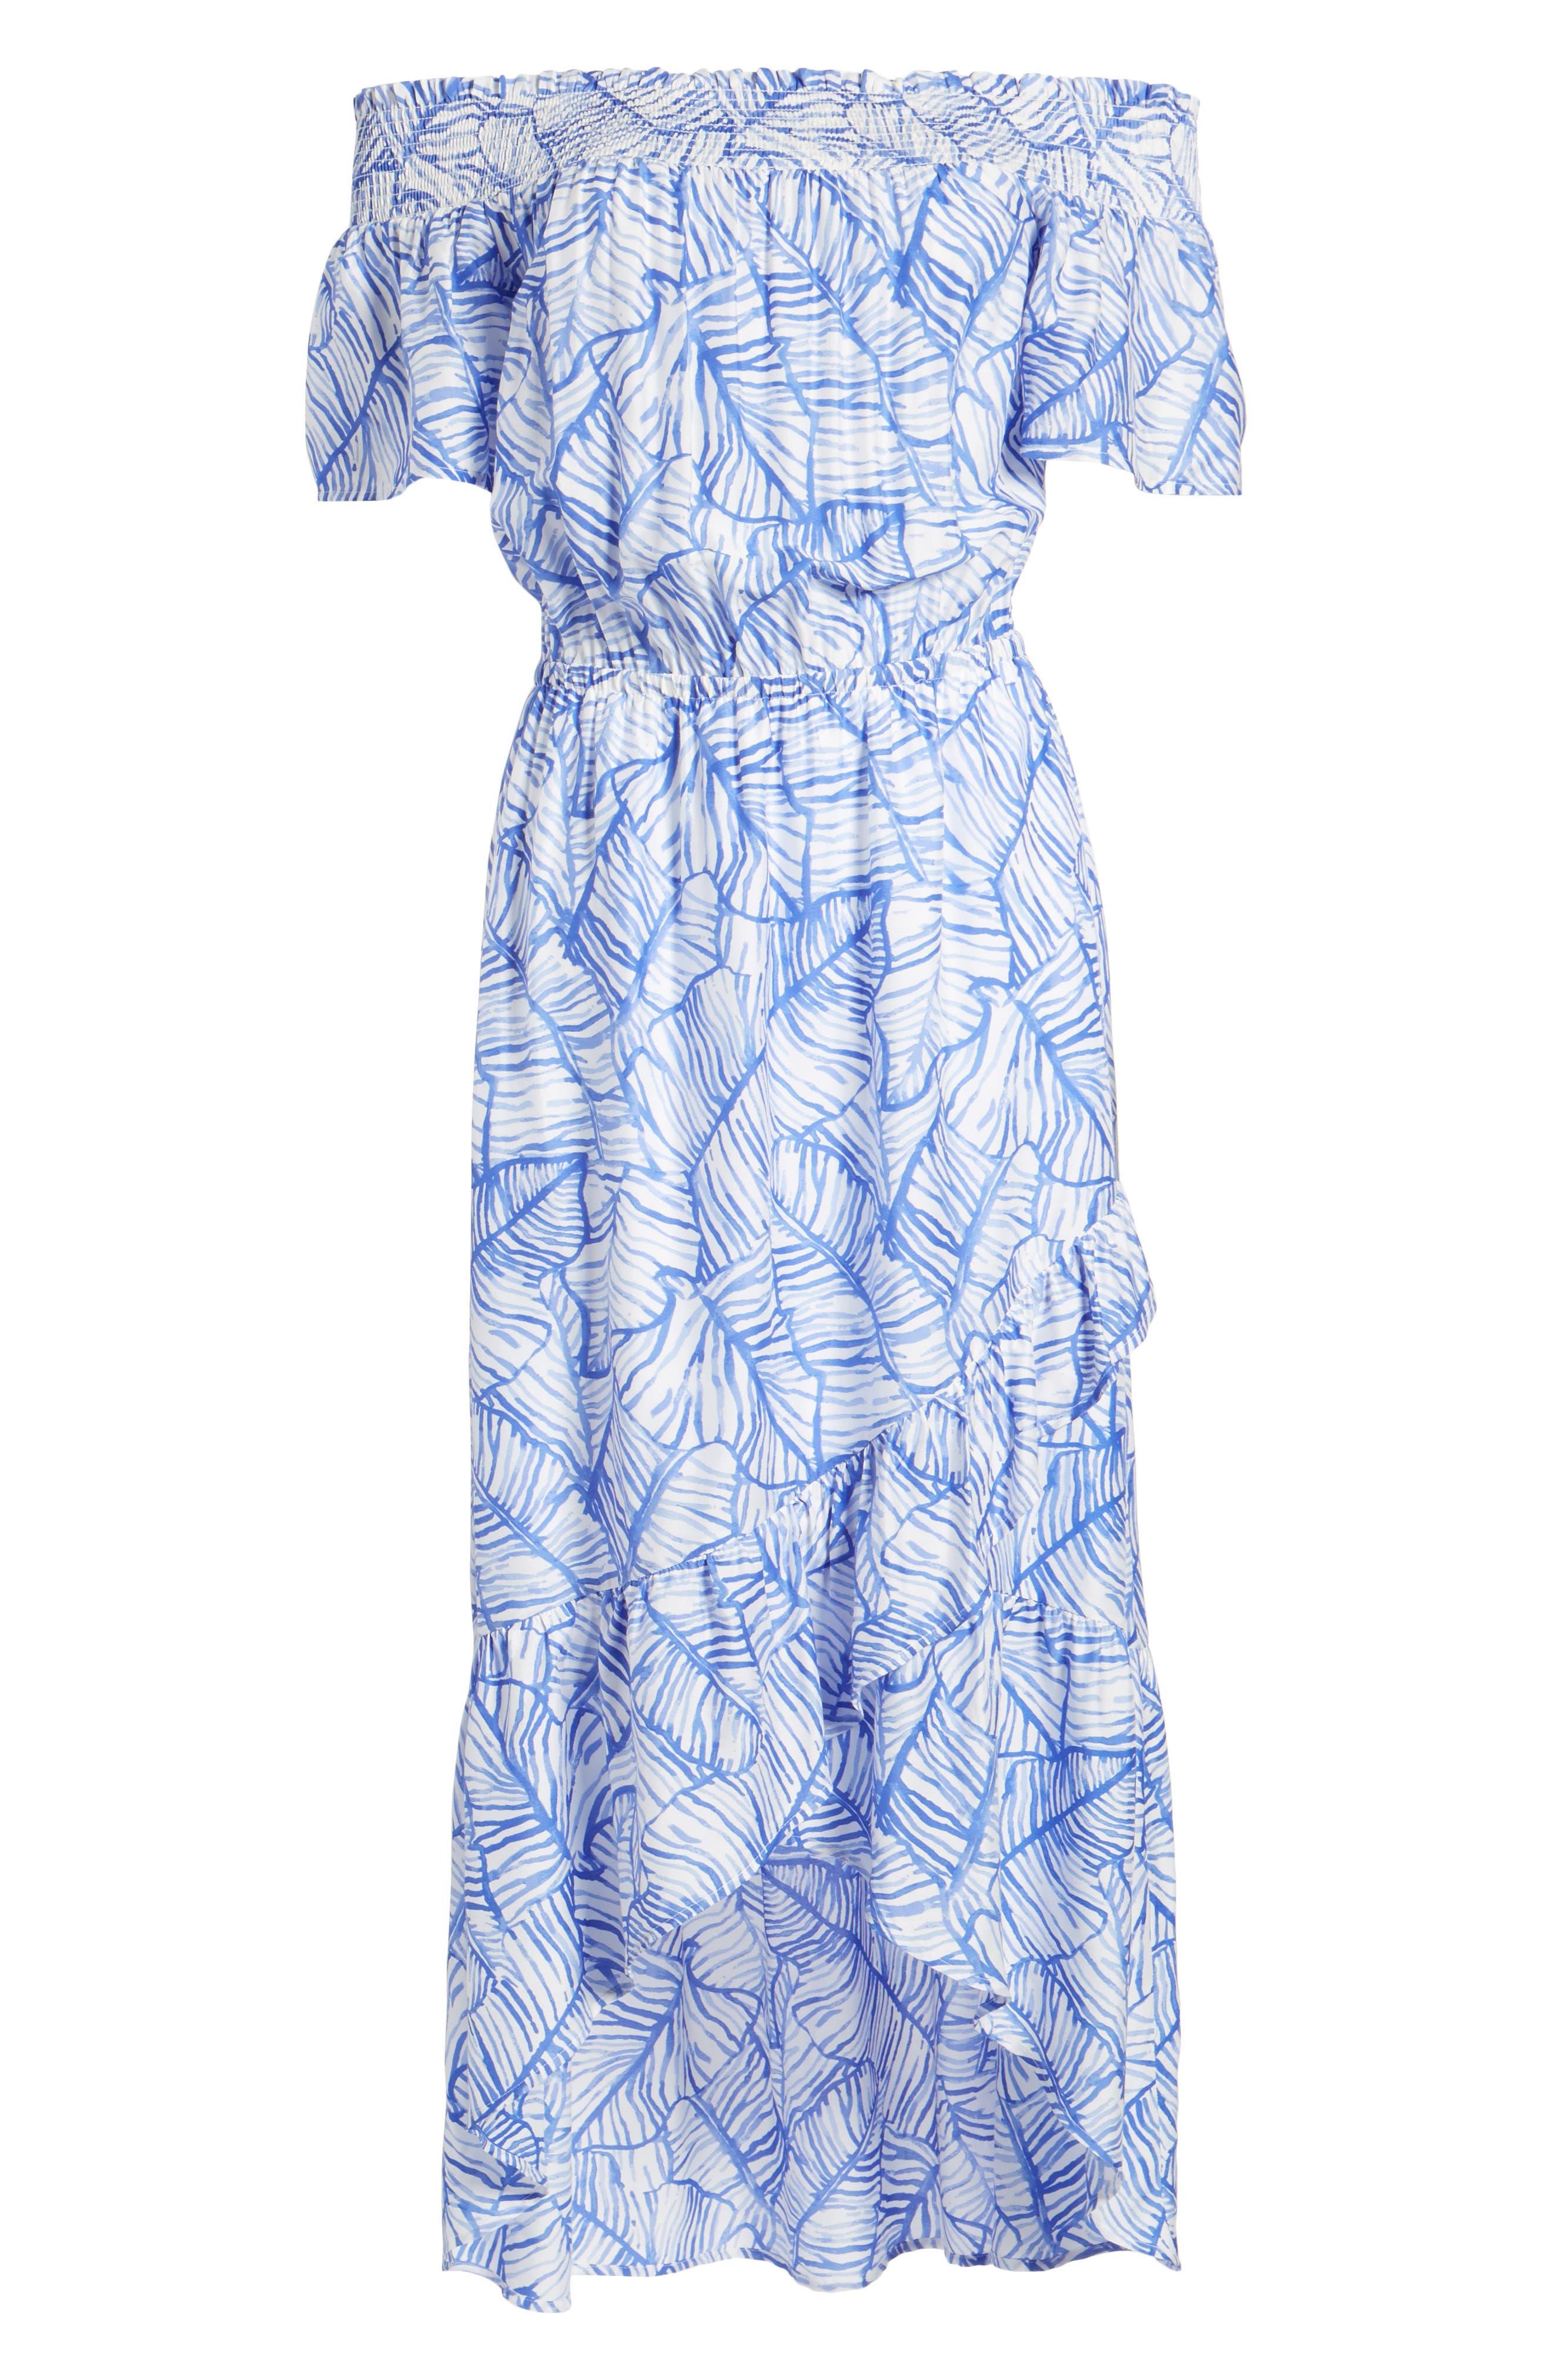 Banana Leaf High/Low Maxi Dress,                             Alternate thumbnail 6, color,                             Marlin